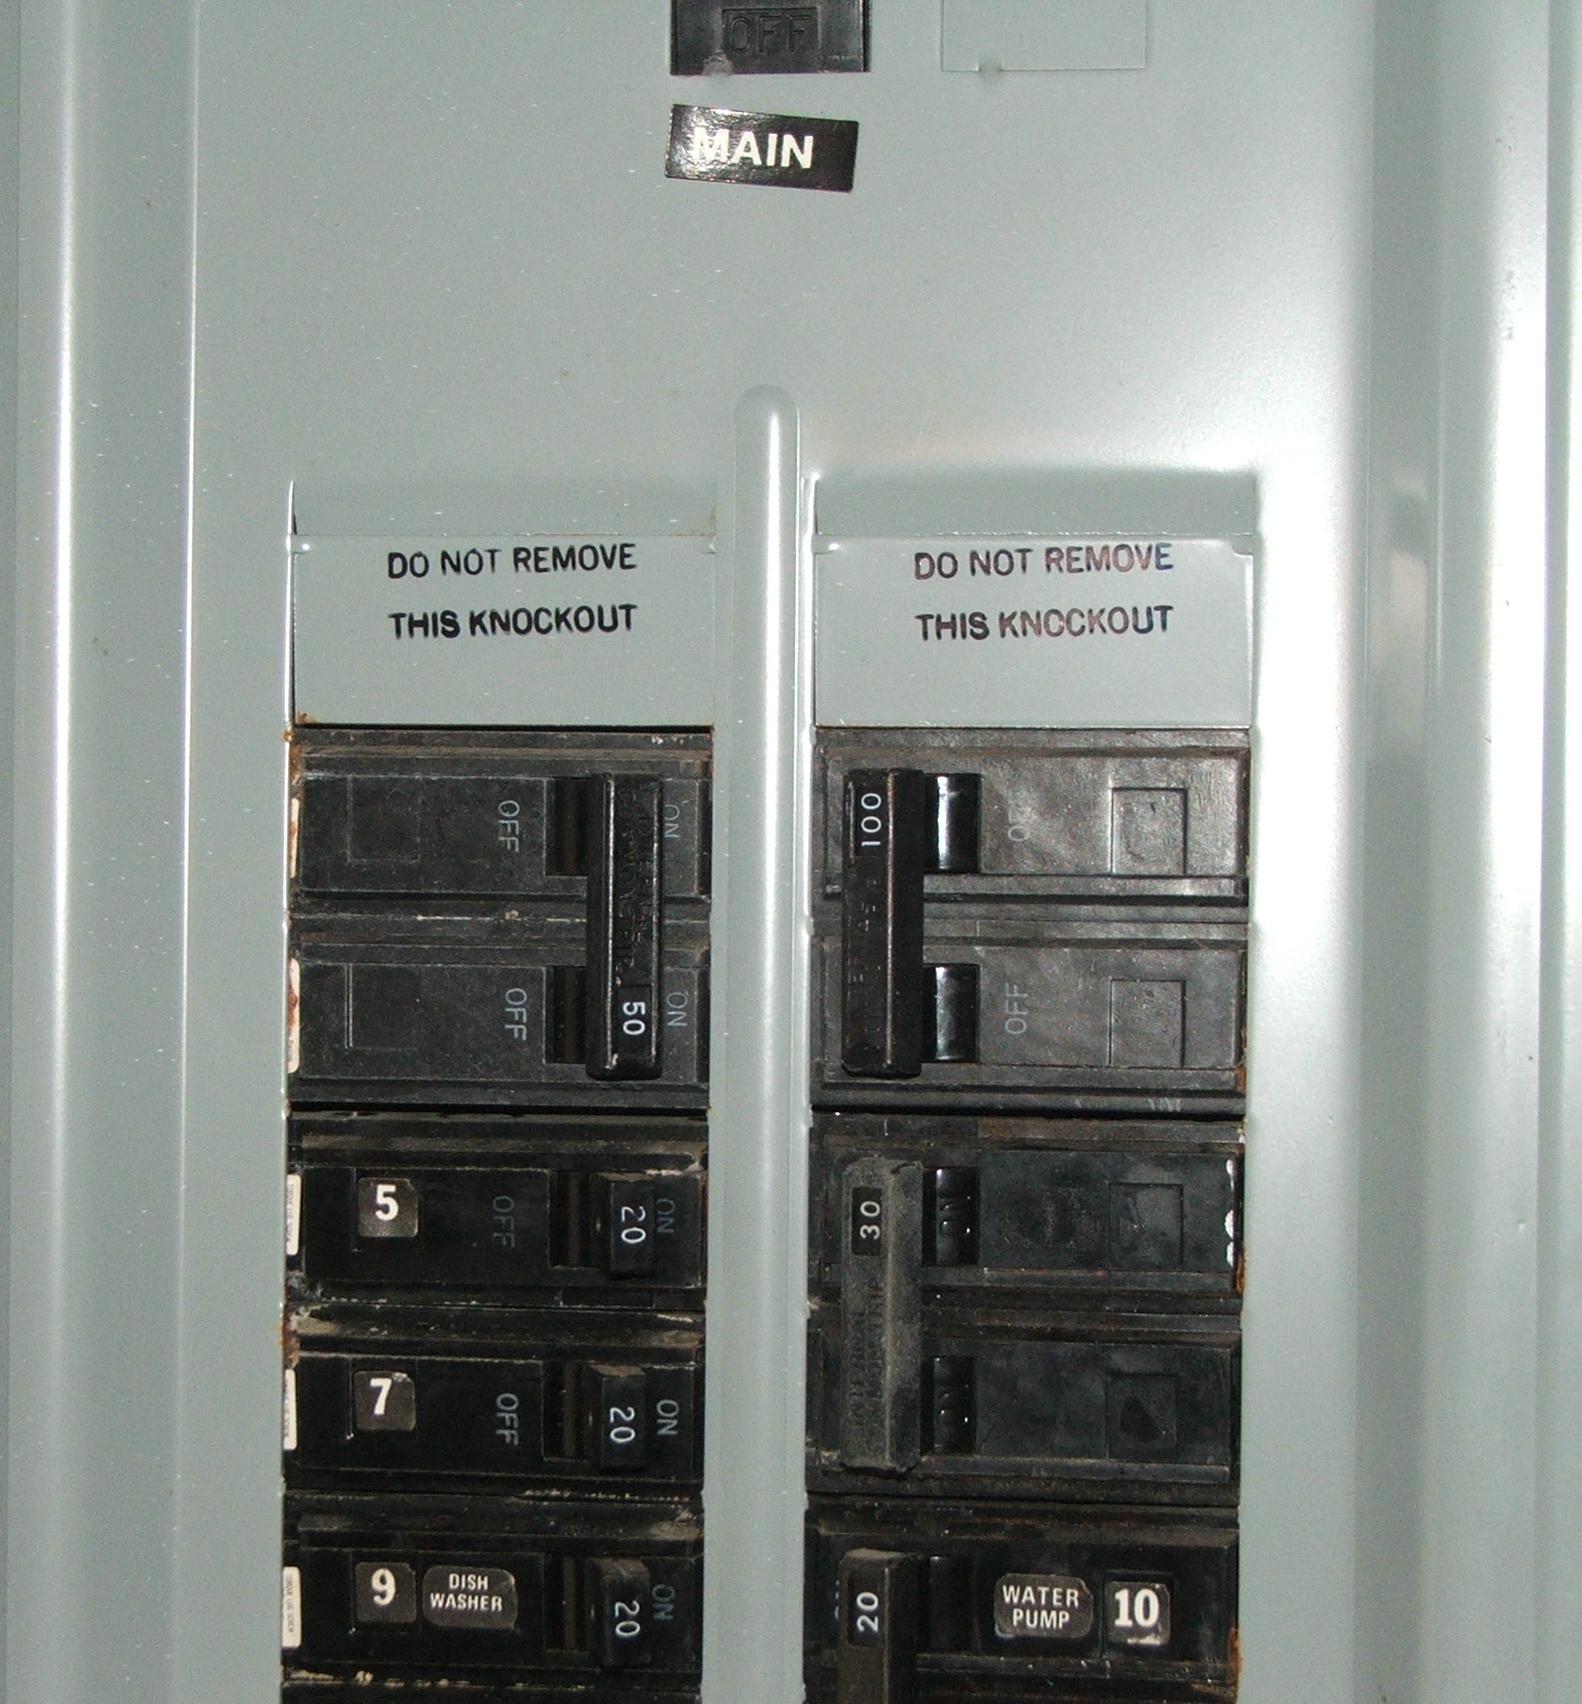 Main Distribution Board Or Fuse Boards Main Distribution Board Or Fuse